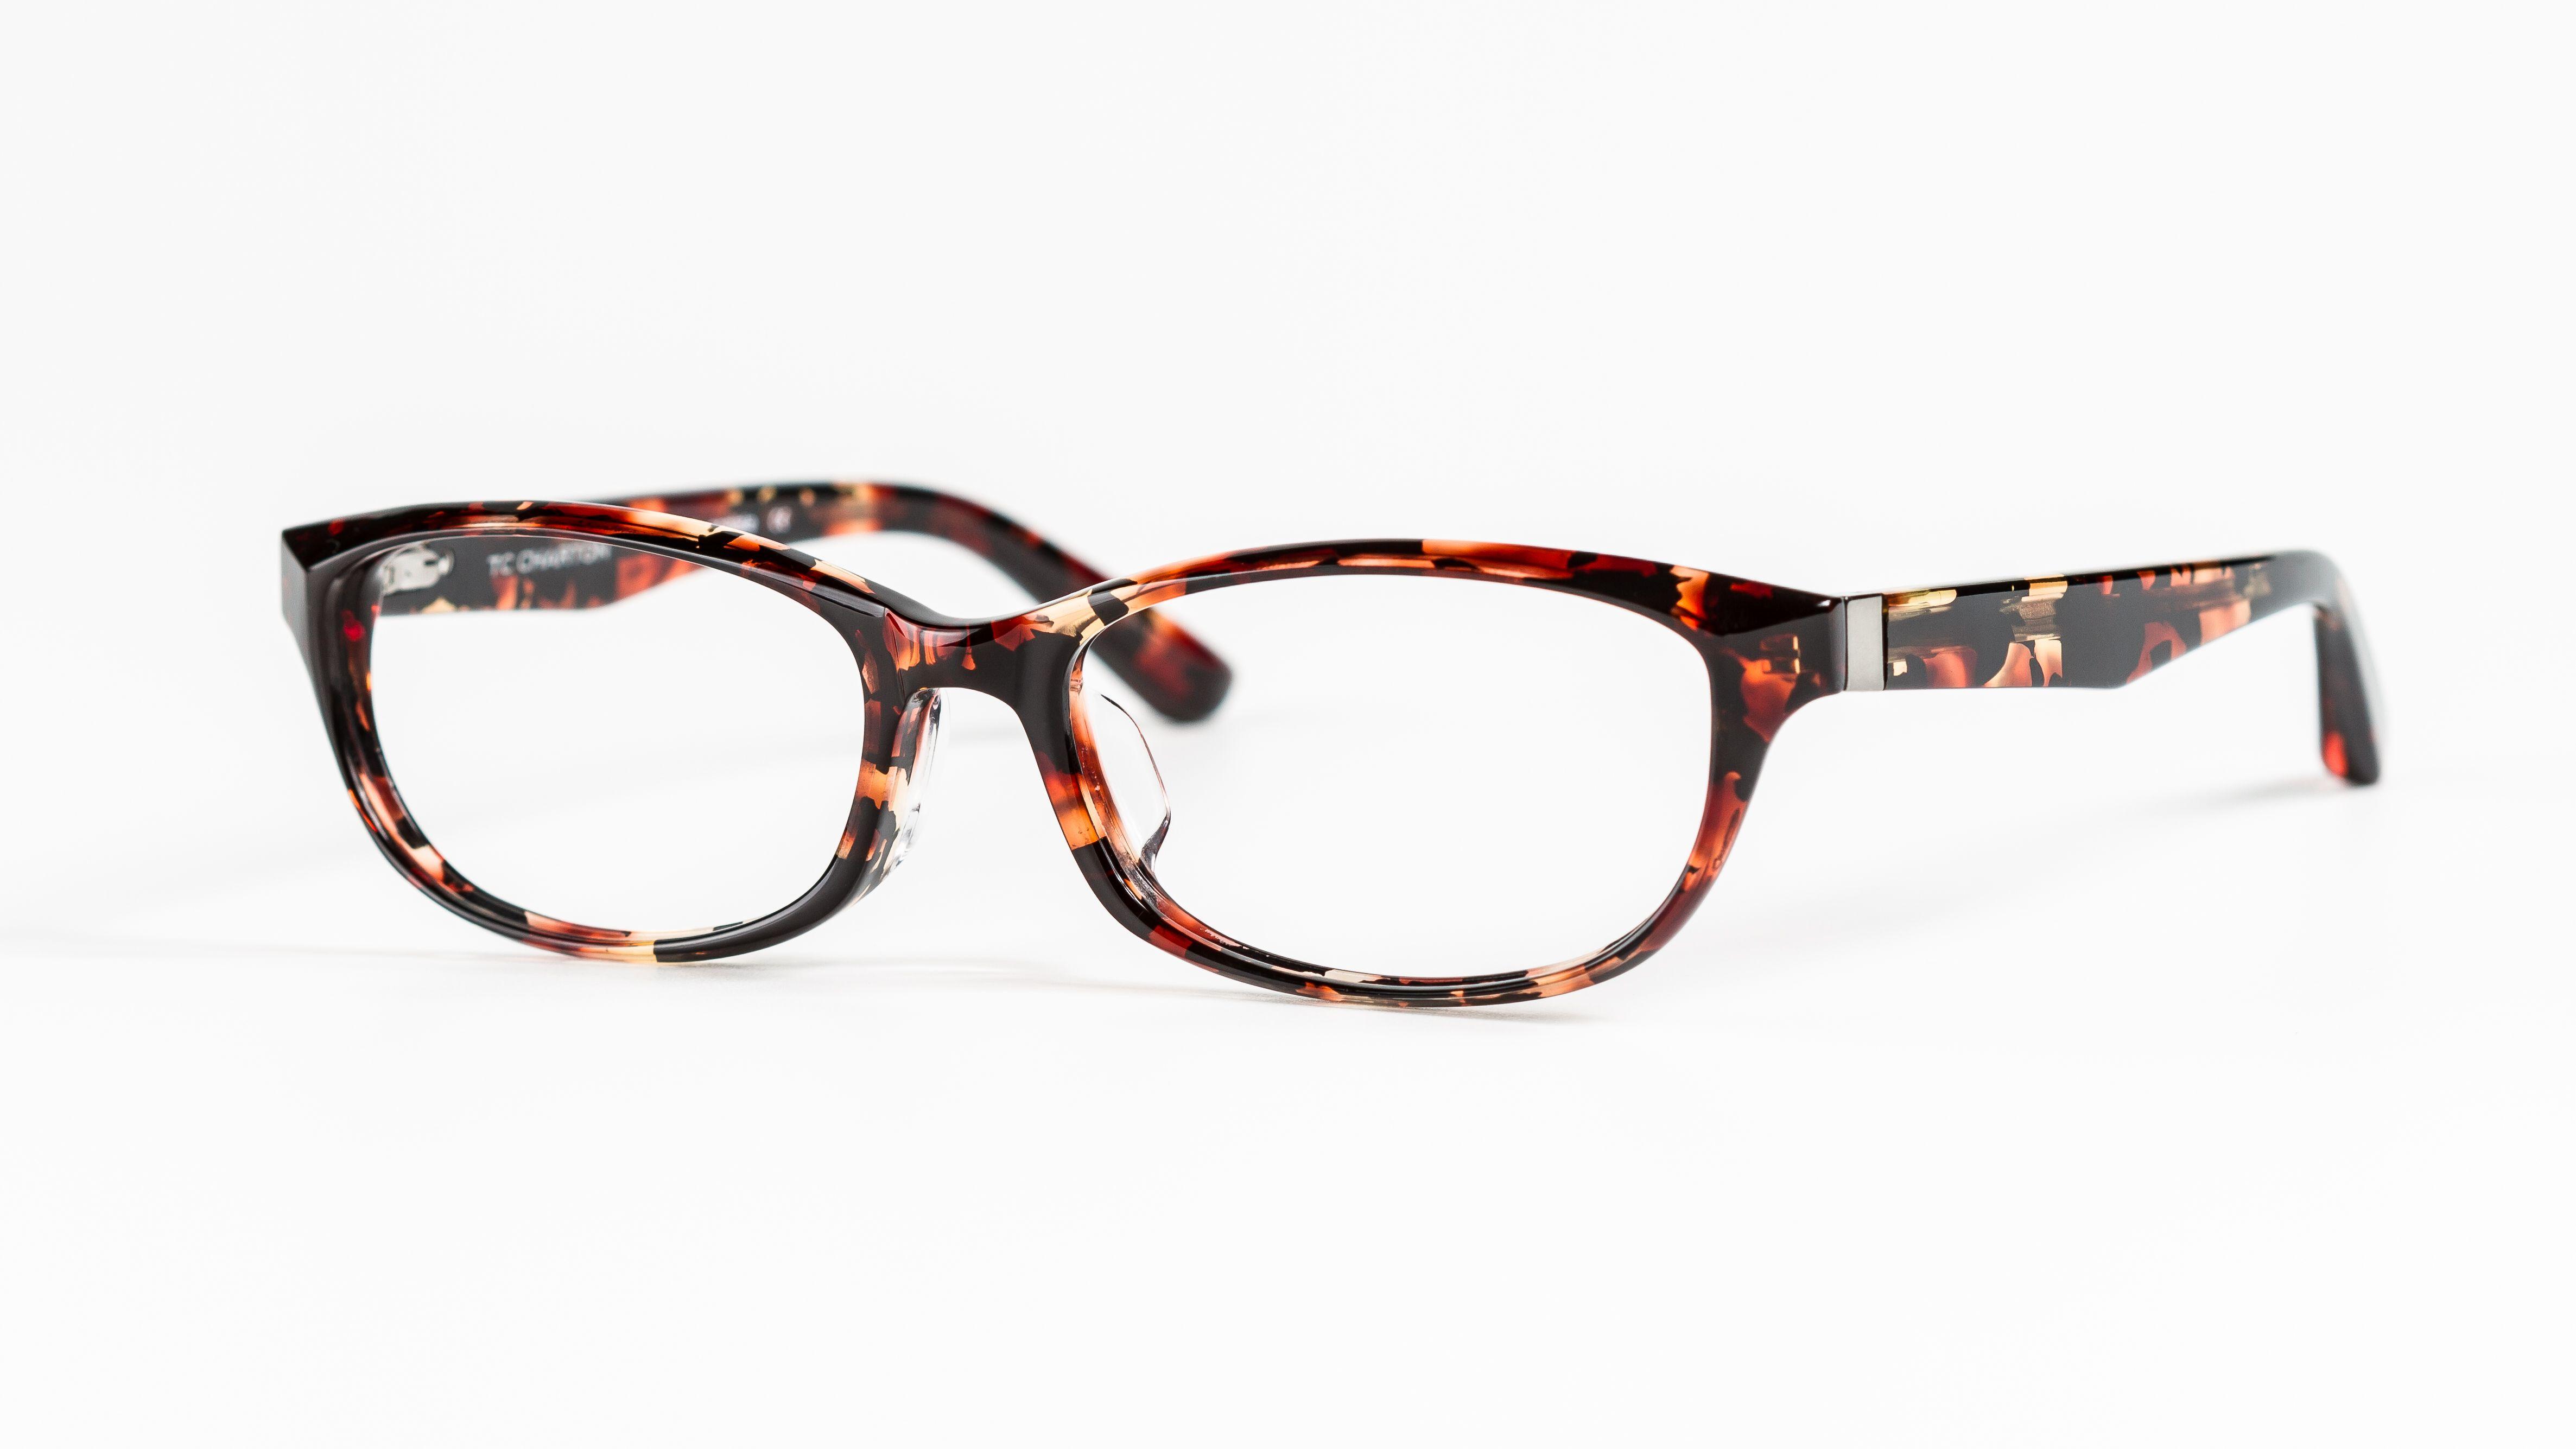 8f6a368174 TC CHARTON Asian Fit Eyewear -